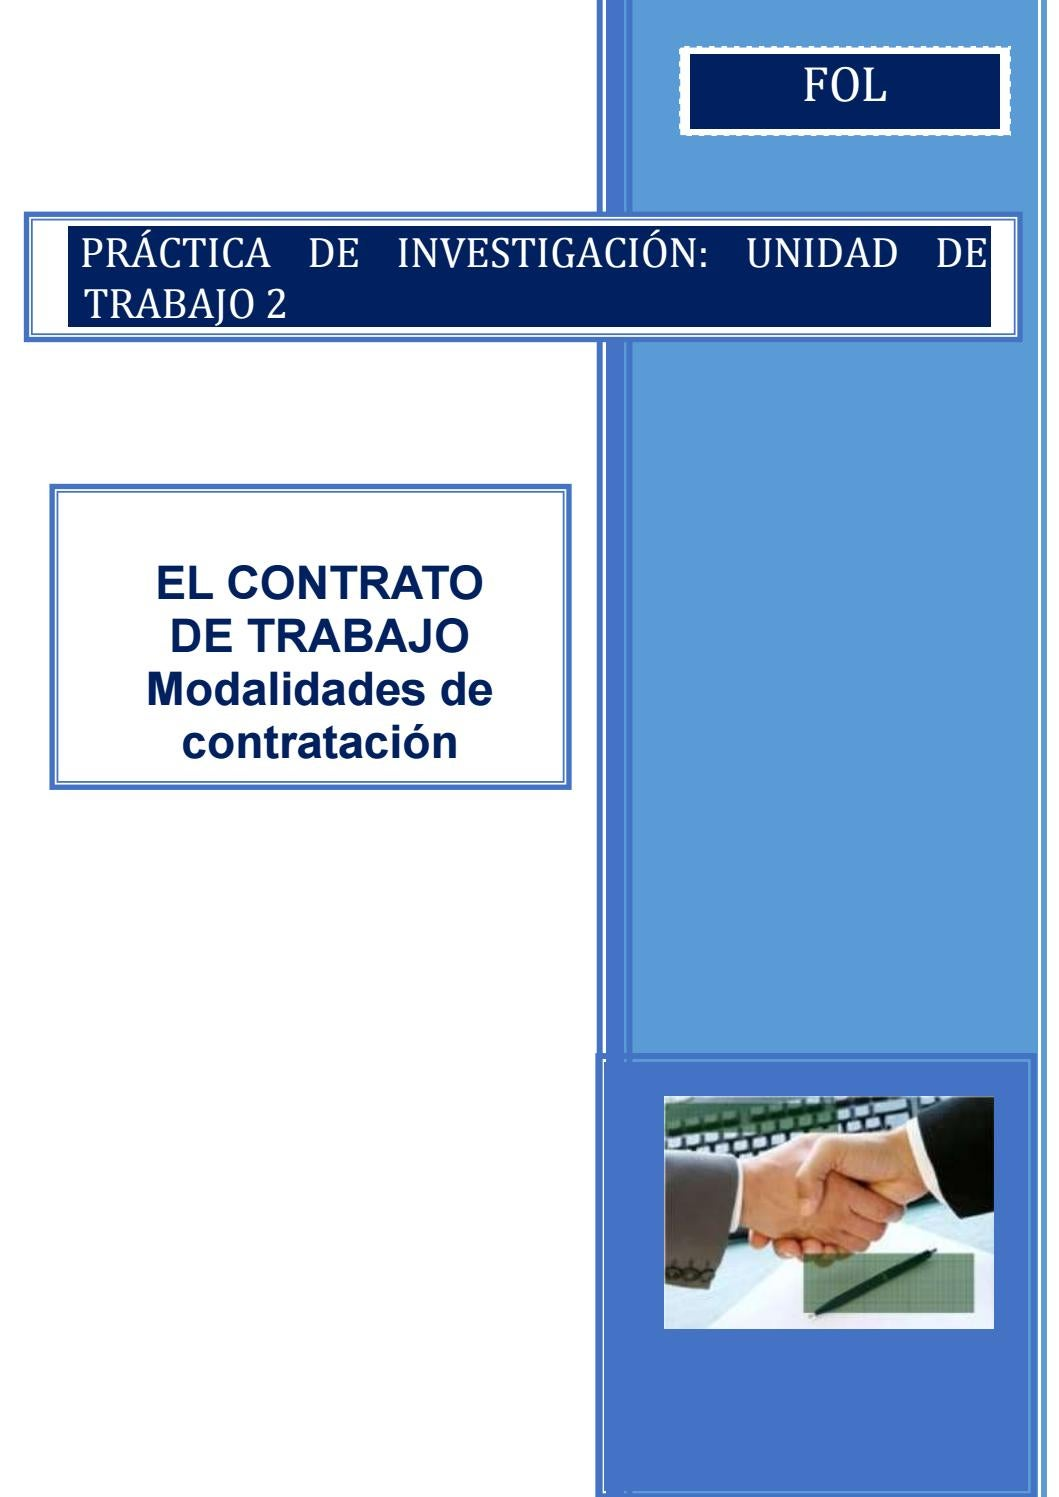 Práctica De Investigación Modalidades De Contrato De Trabajo By Folcovadonga Issuu